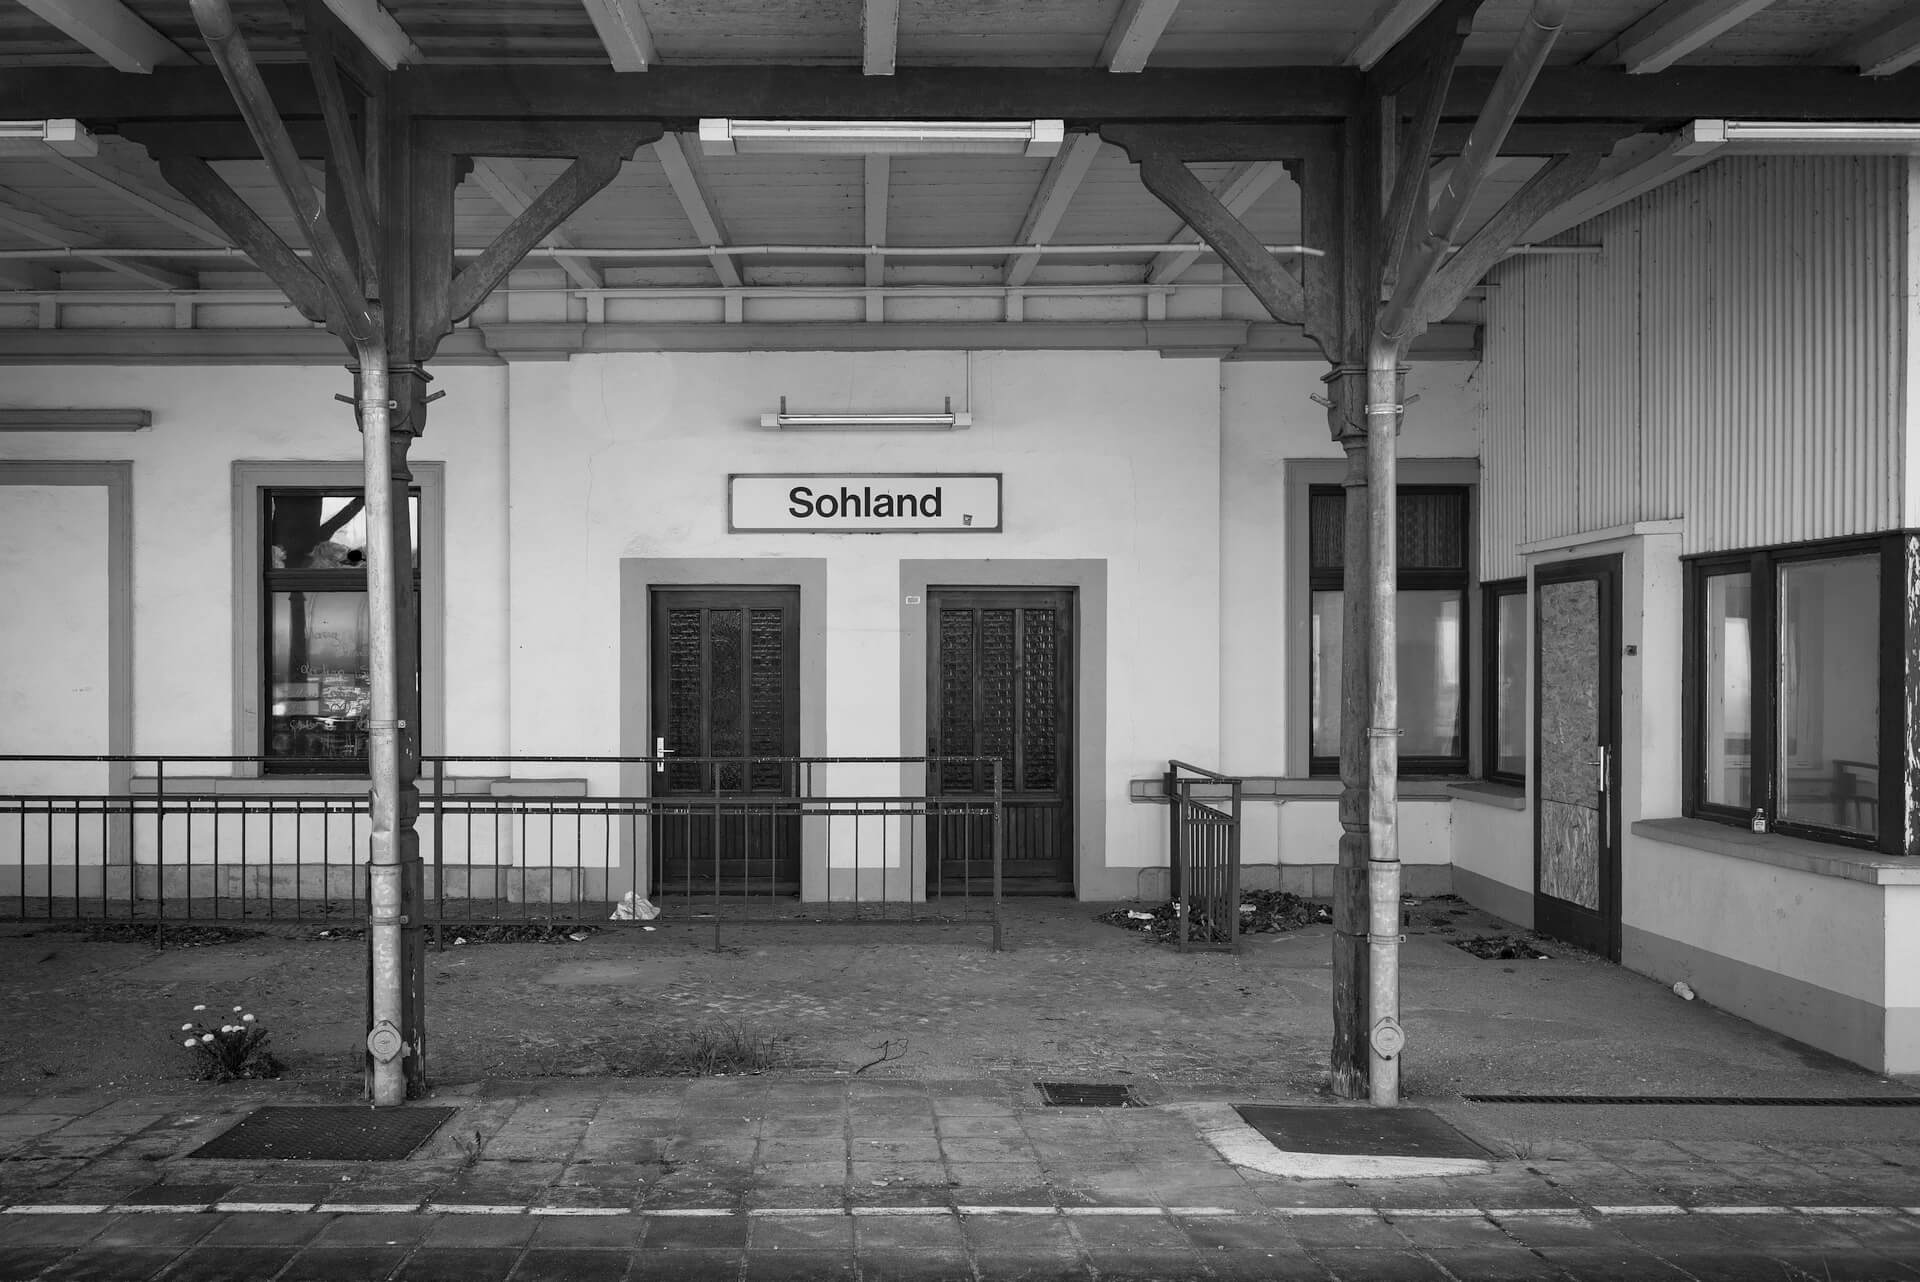 Bahnhof Sohland